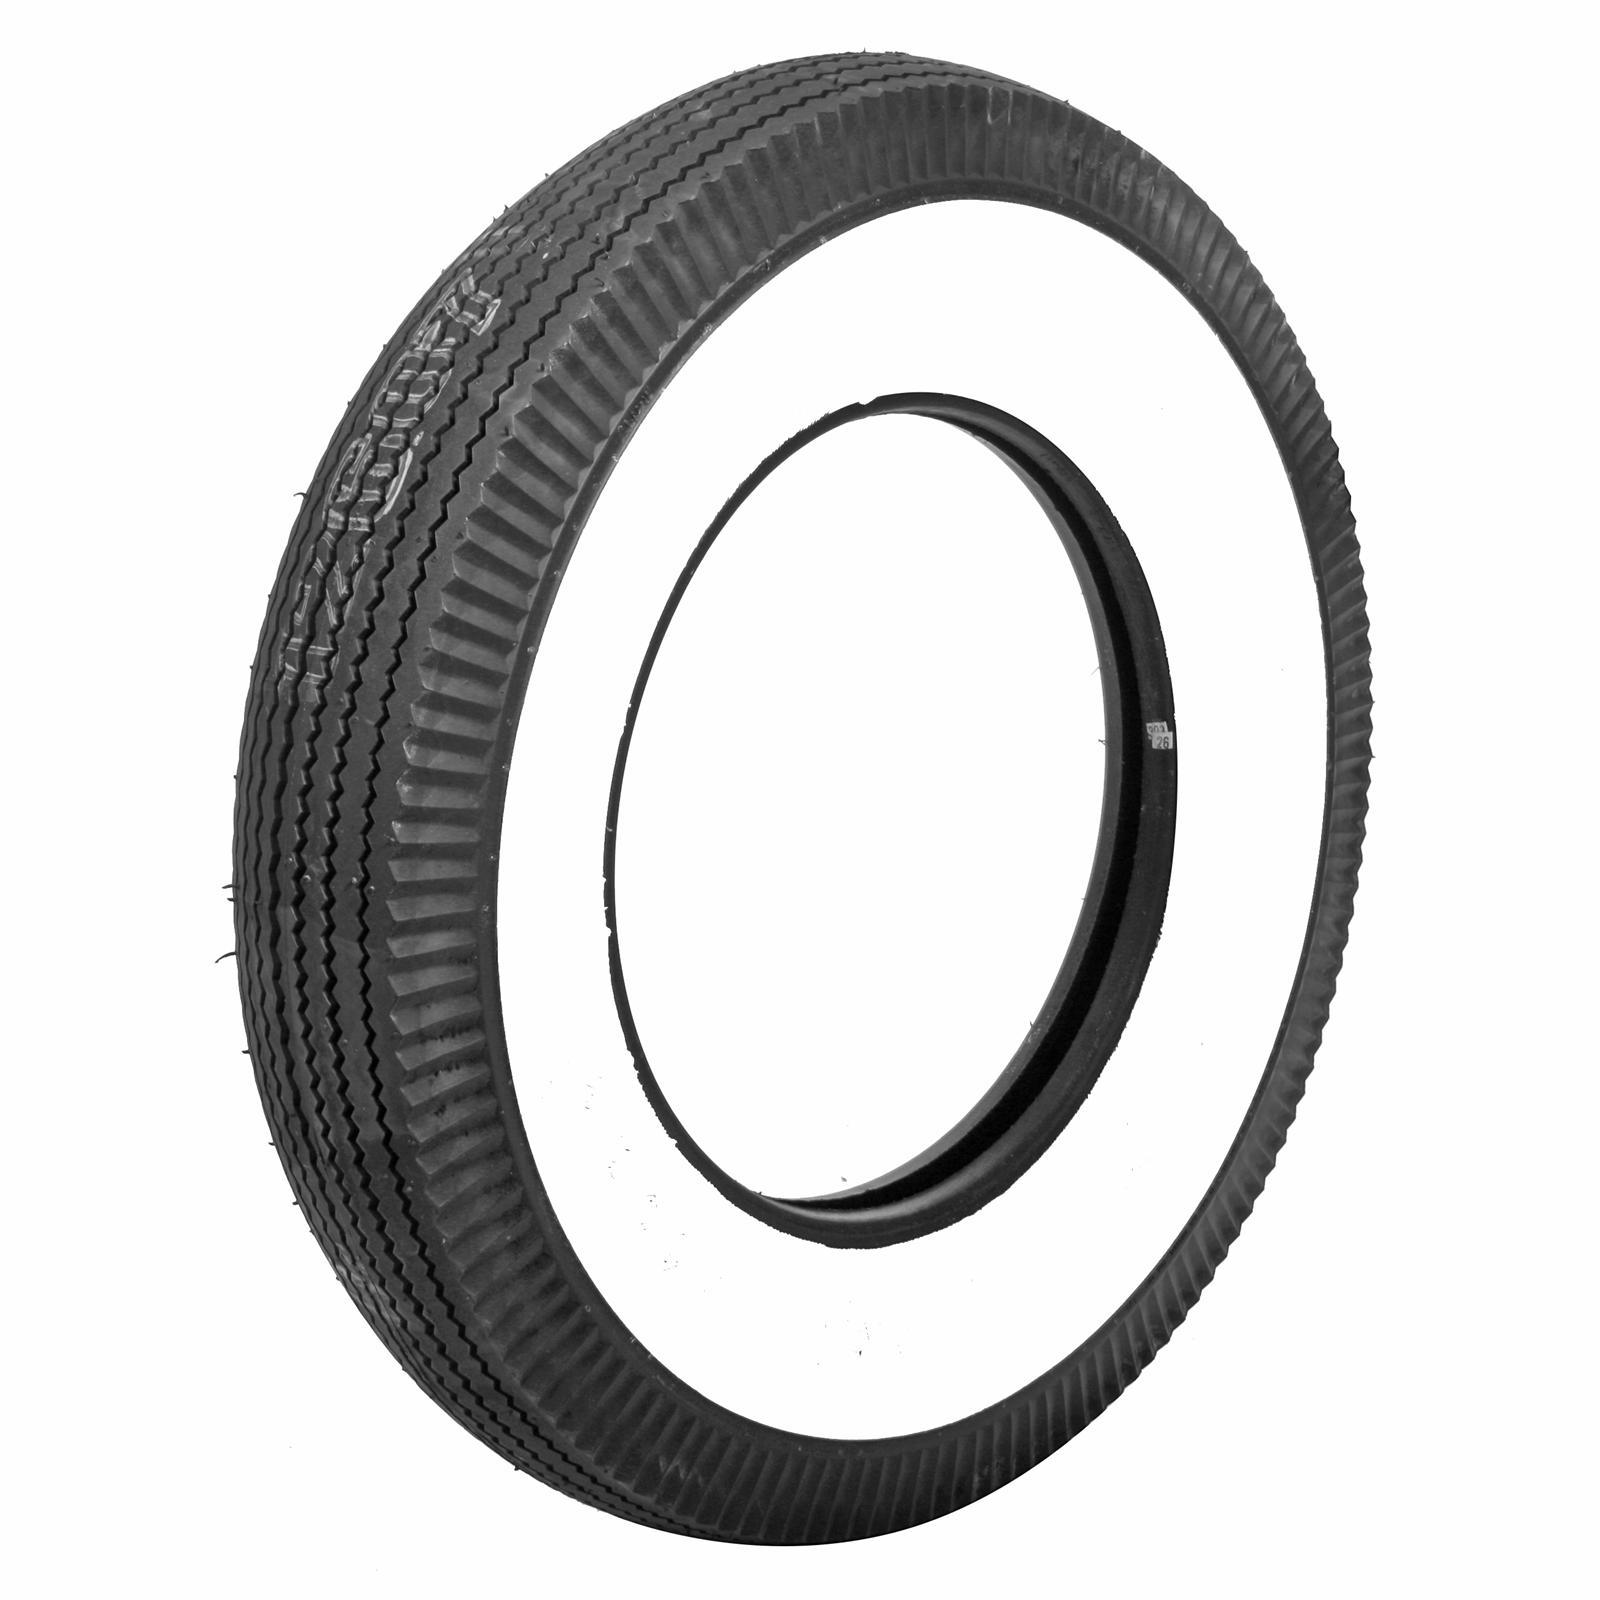 set of 4 coker firestone vintage bias tires 60016 bias